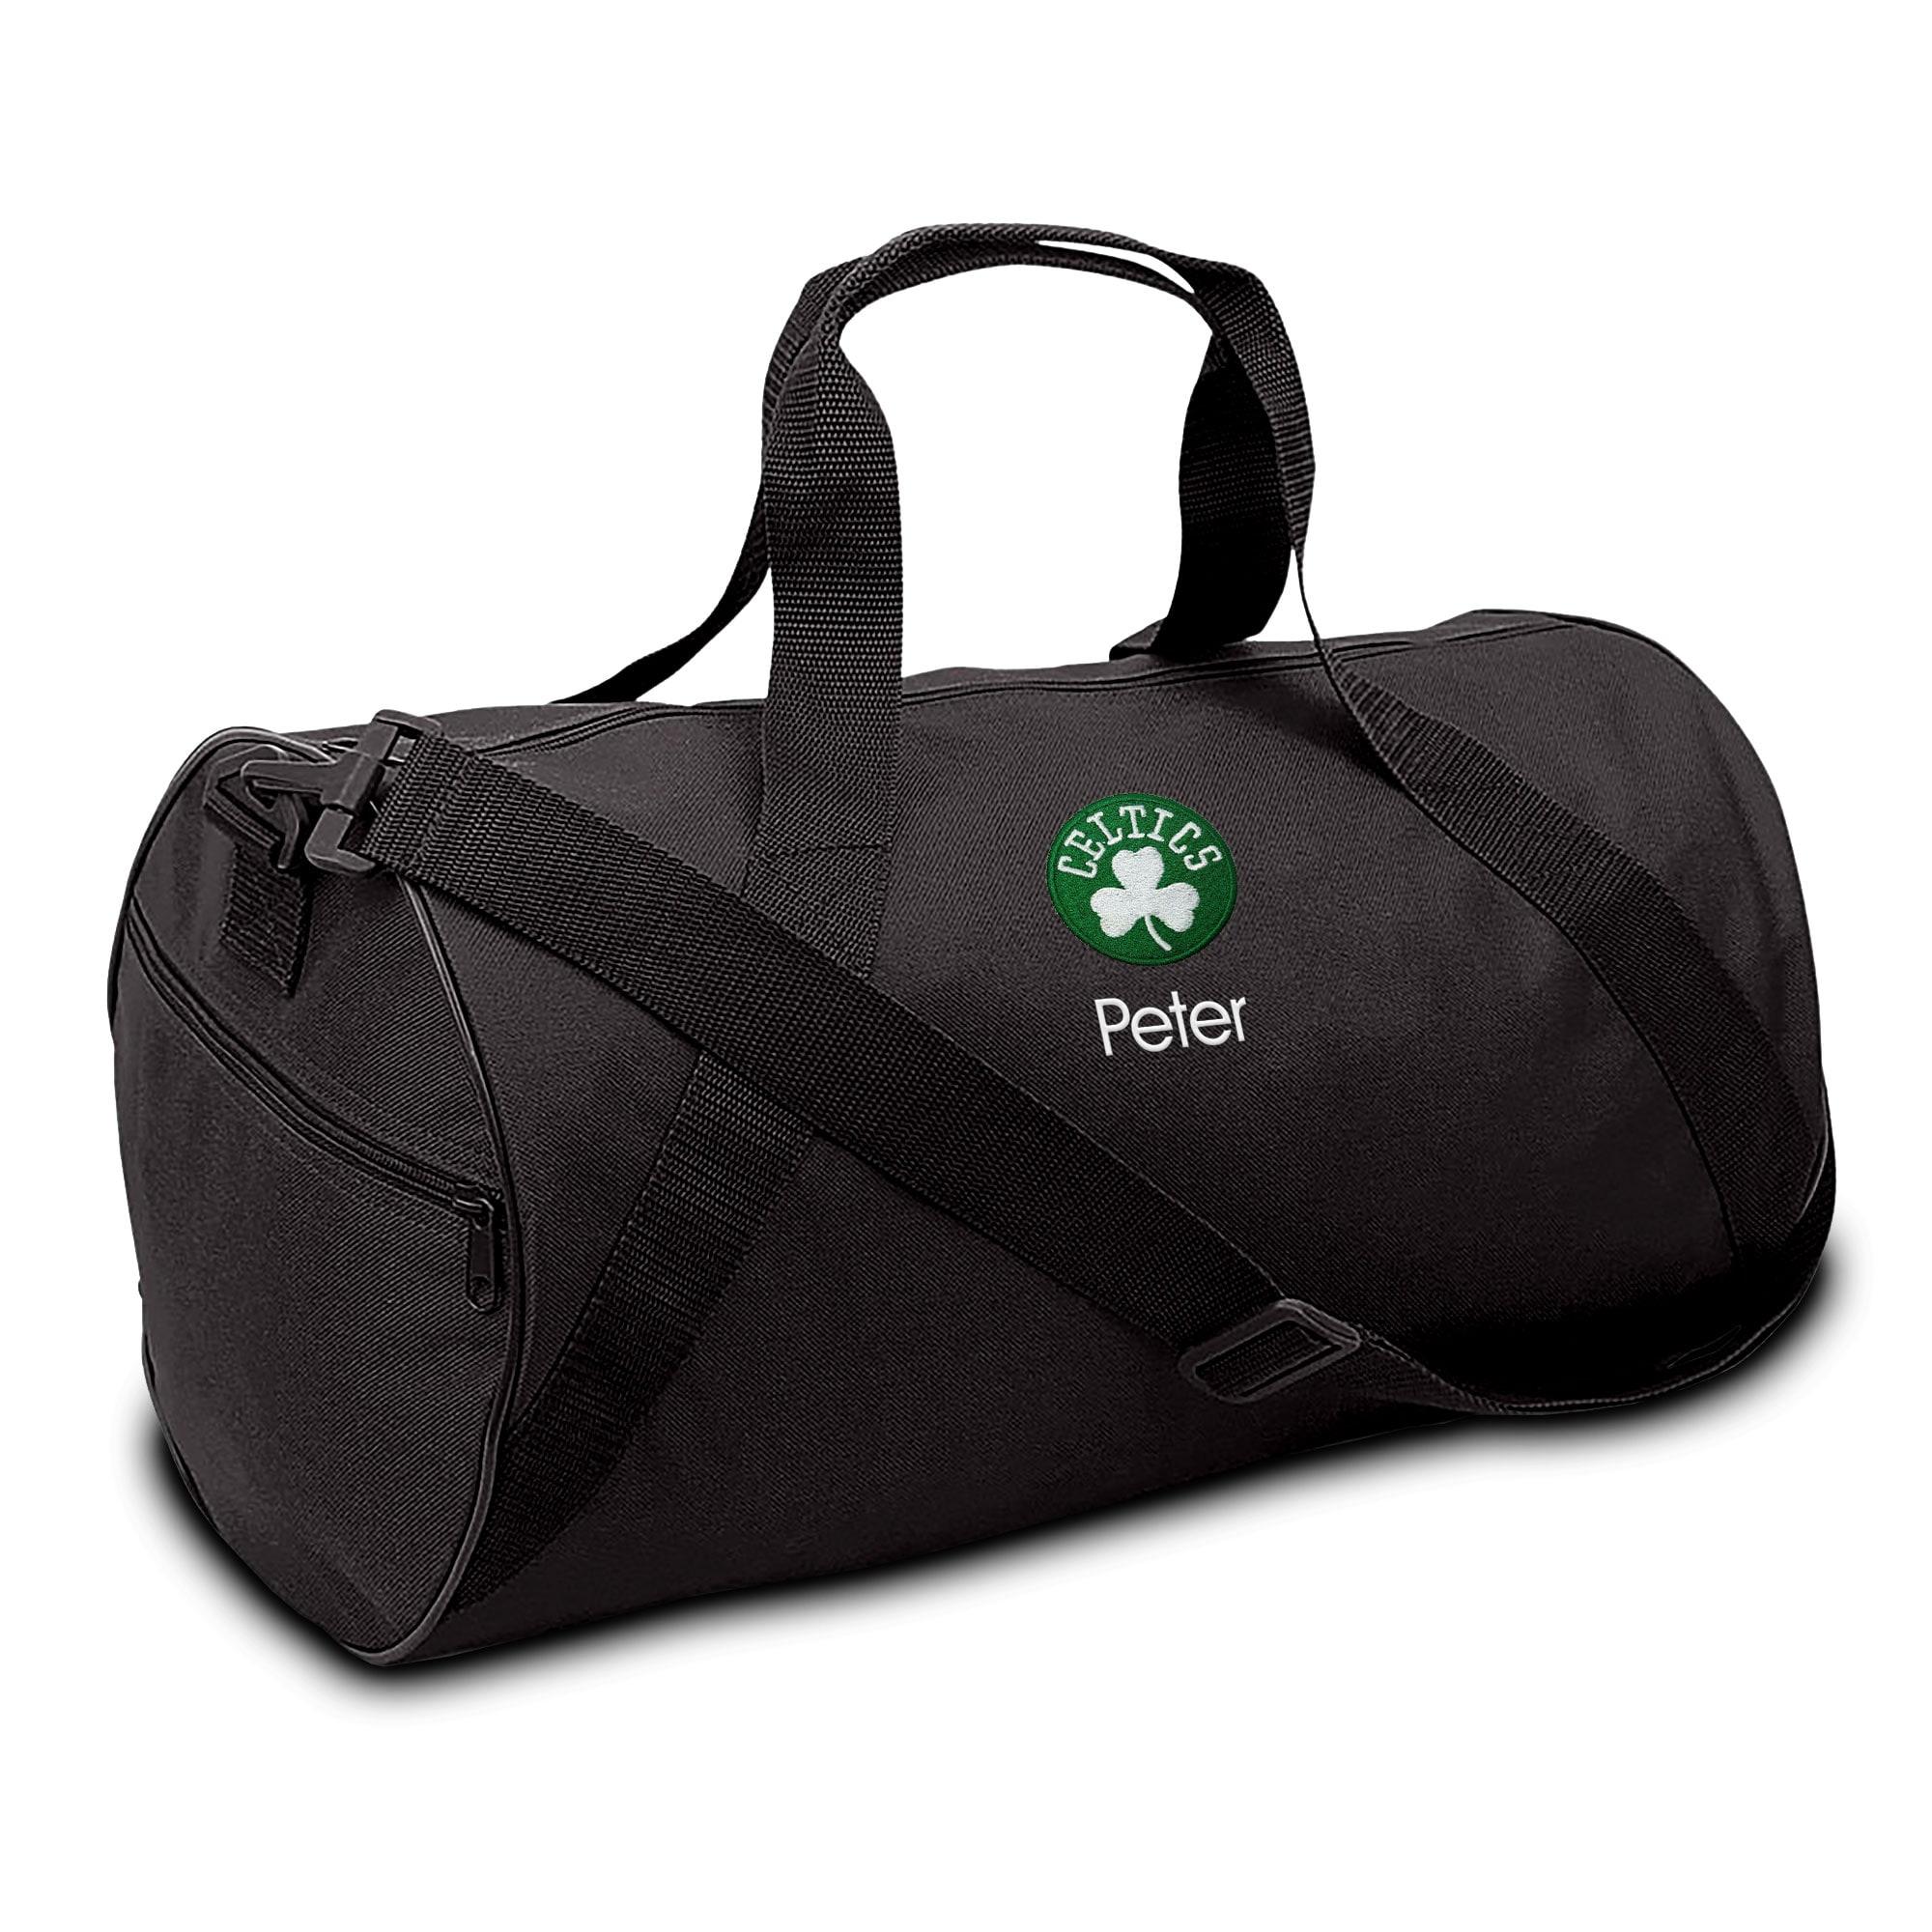 Boston Celtics Youth Personalized Duffel Bag - Black